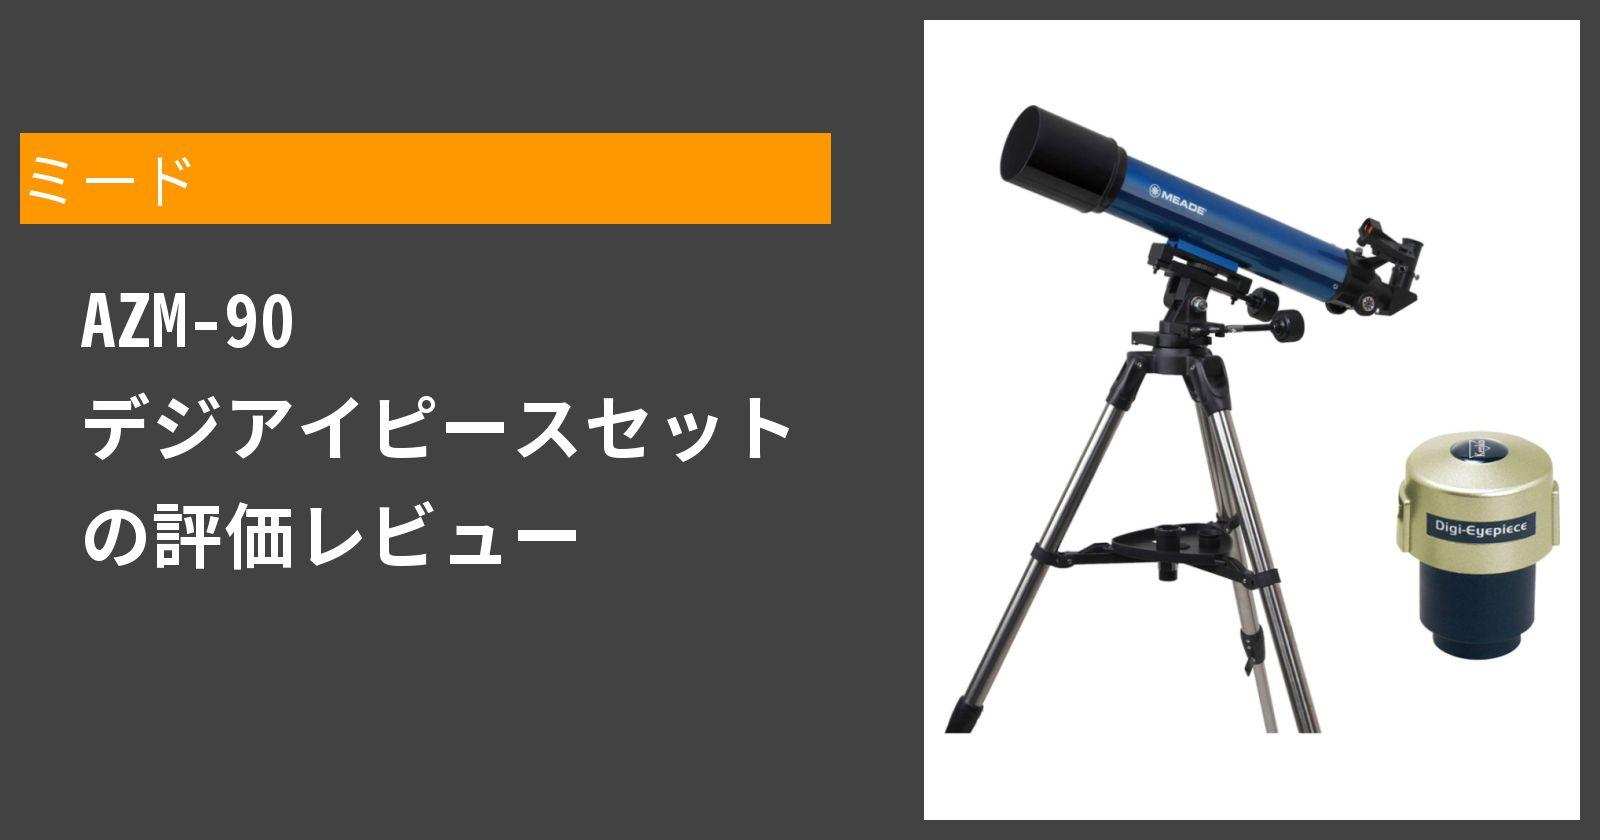 AZM-90 デジアイピースセットを徹底評価